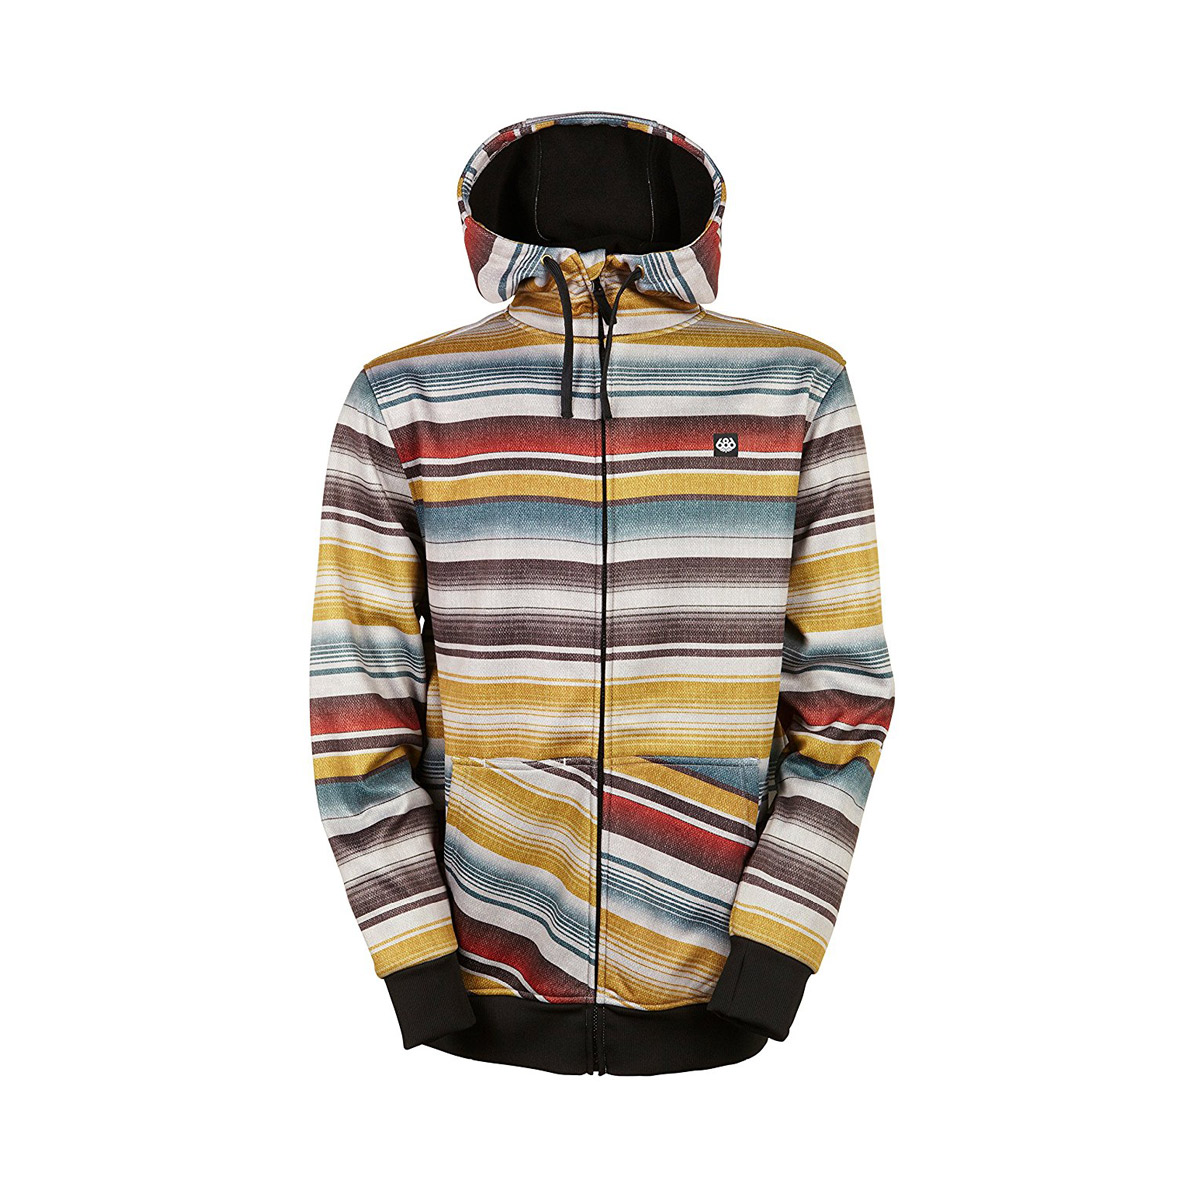 Толстовки 686 Icon Bonded ZIP fleece hoody Blanket 2016/2017